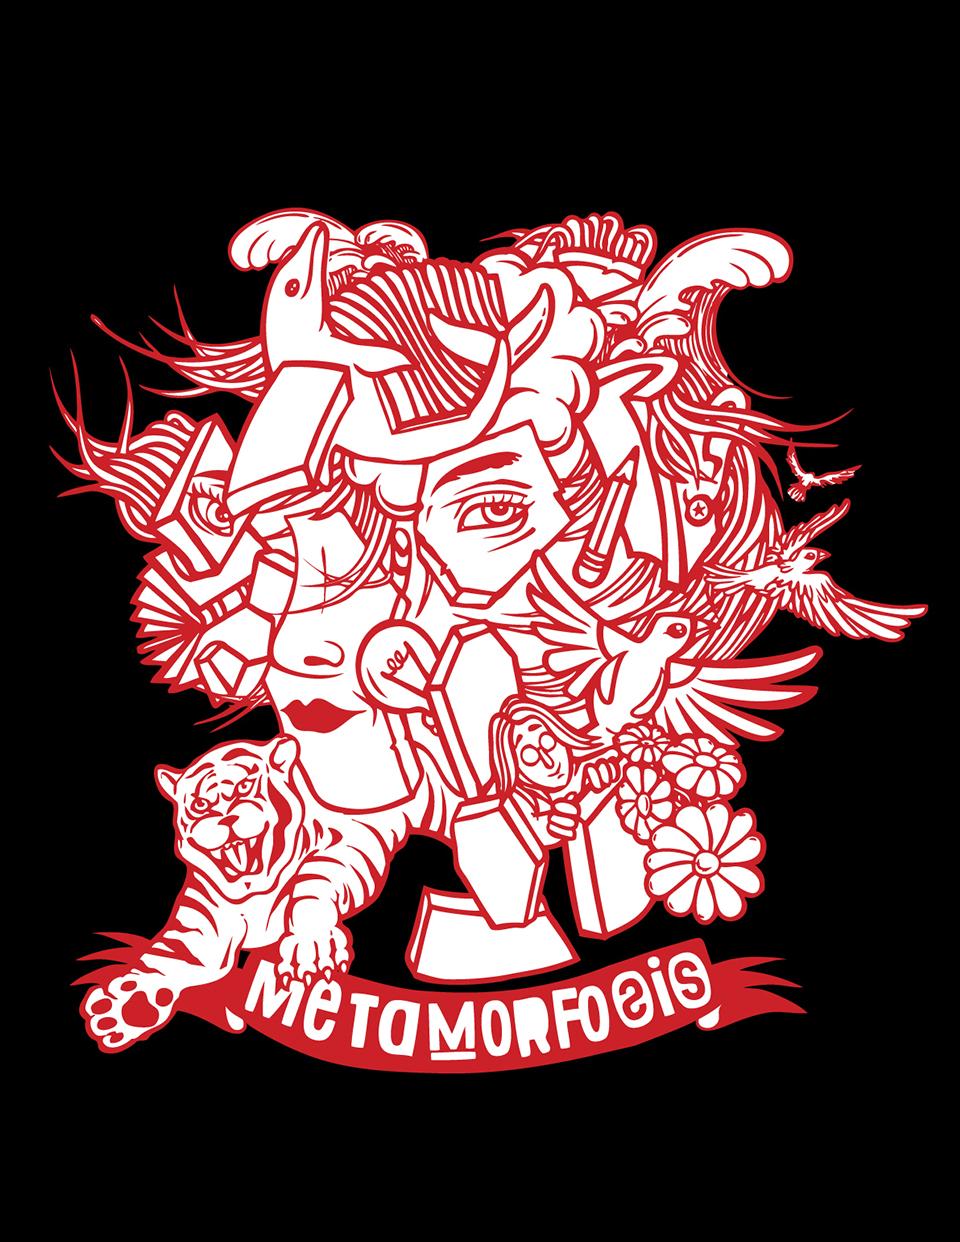 METAMORFOSIS2